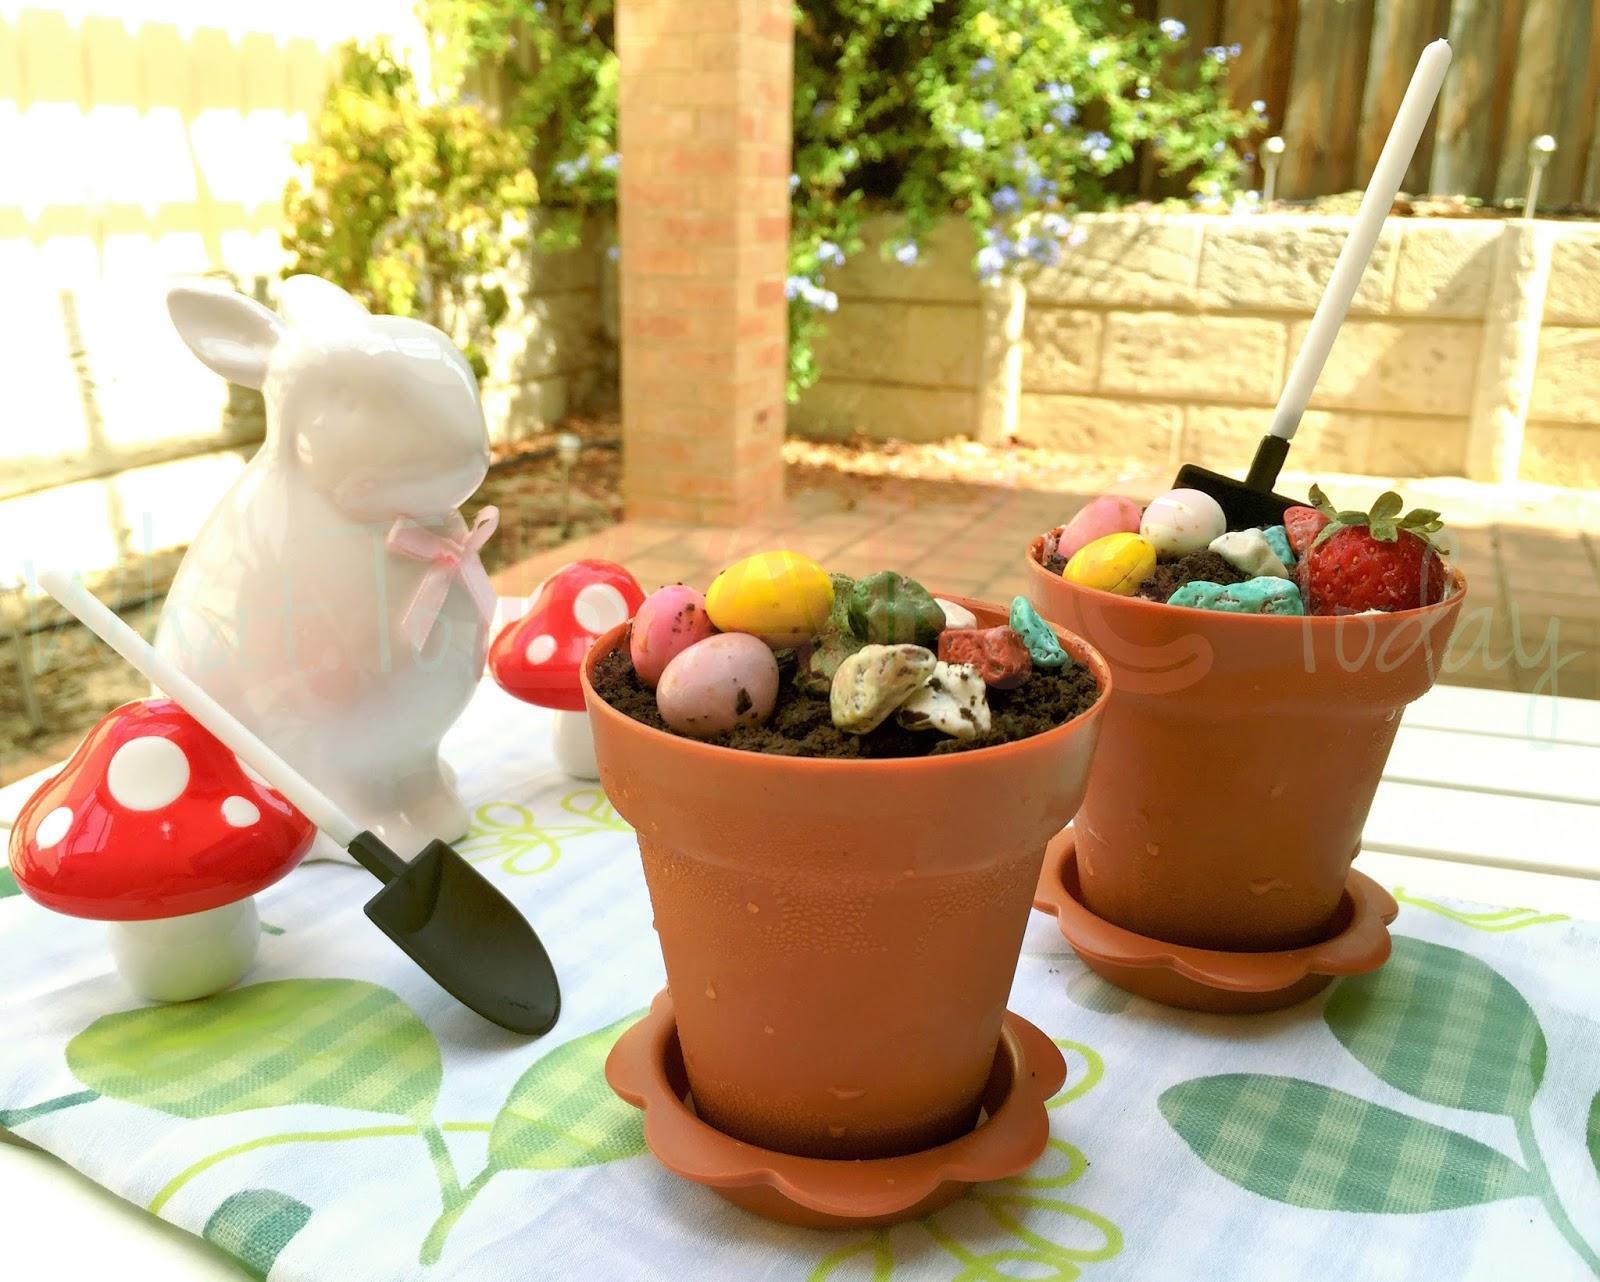 What To Bake Today & What To Bake Today: No-Bake Cookies and Cream Flower Pot Cake (Easter)